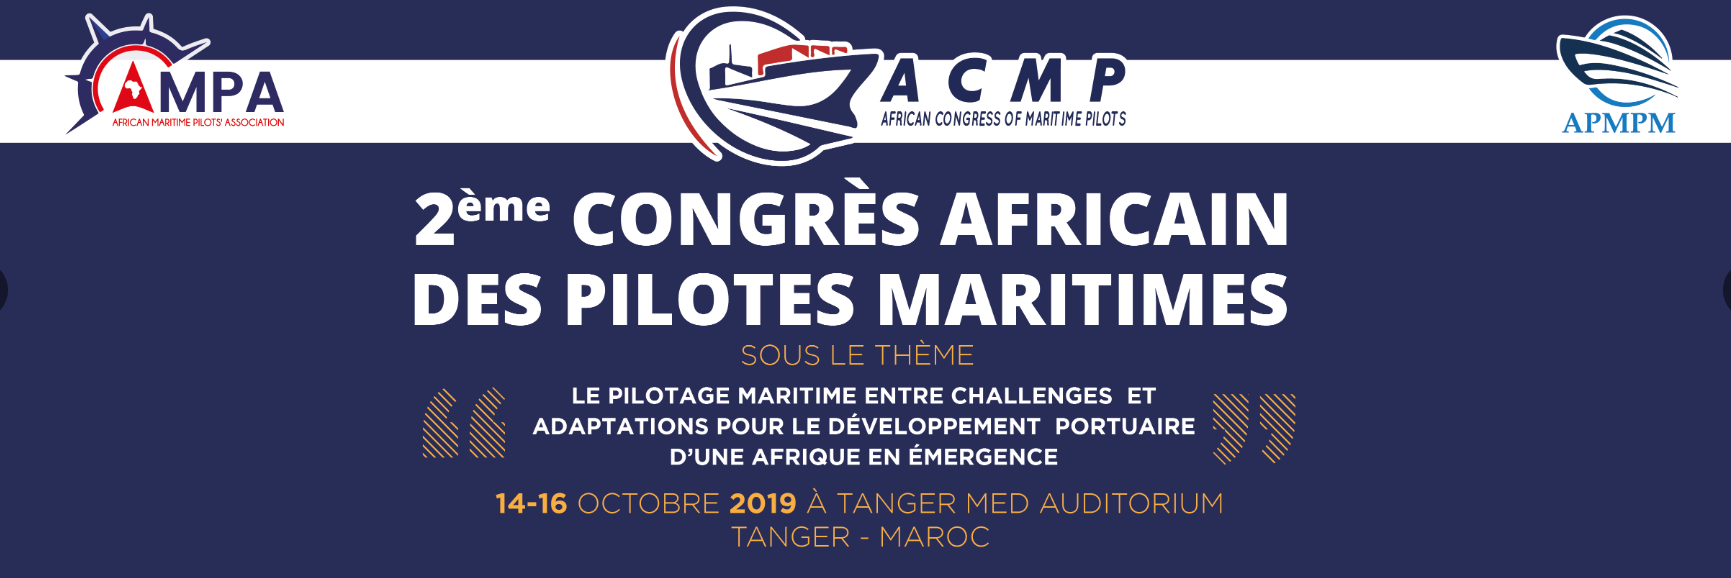 ACMP 2019